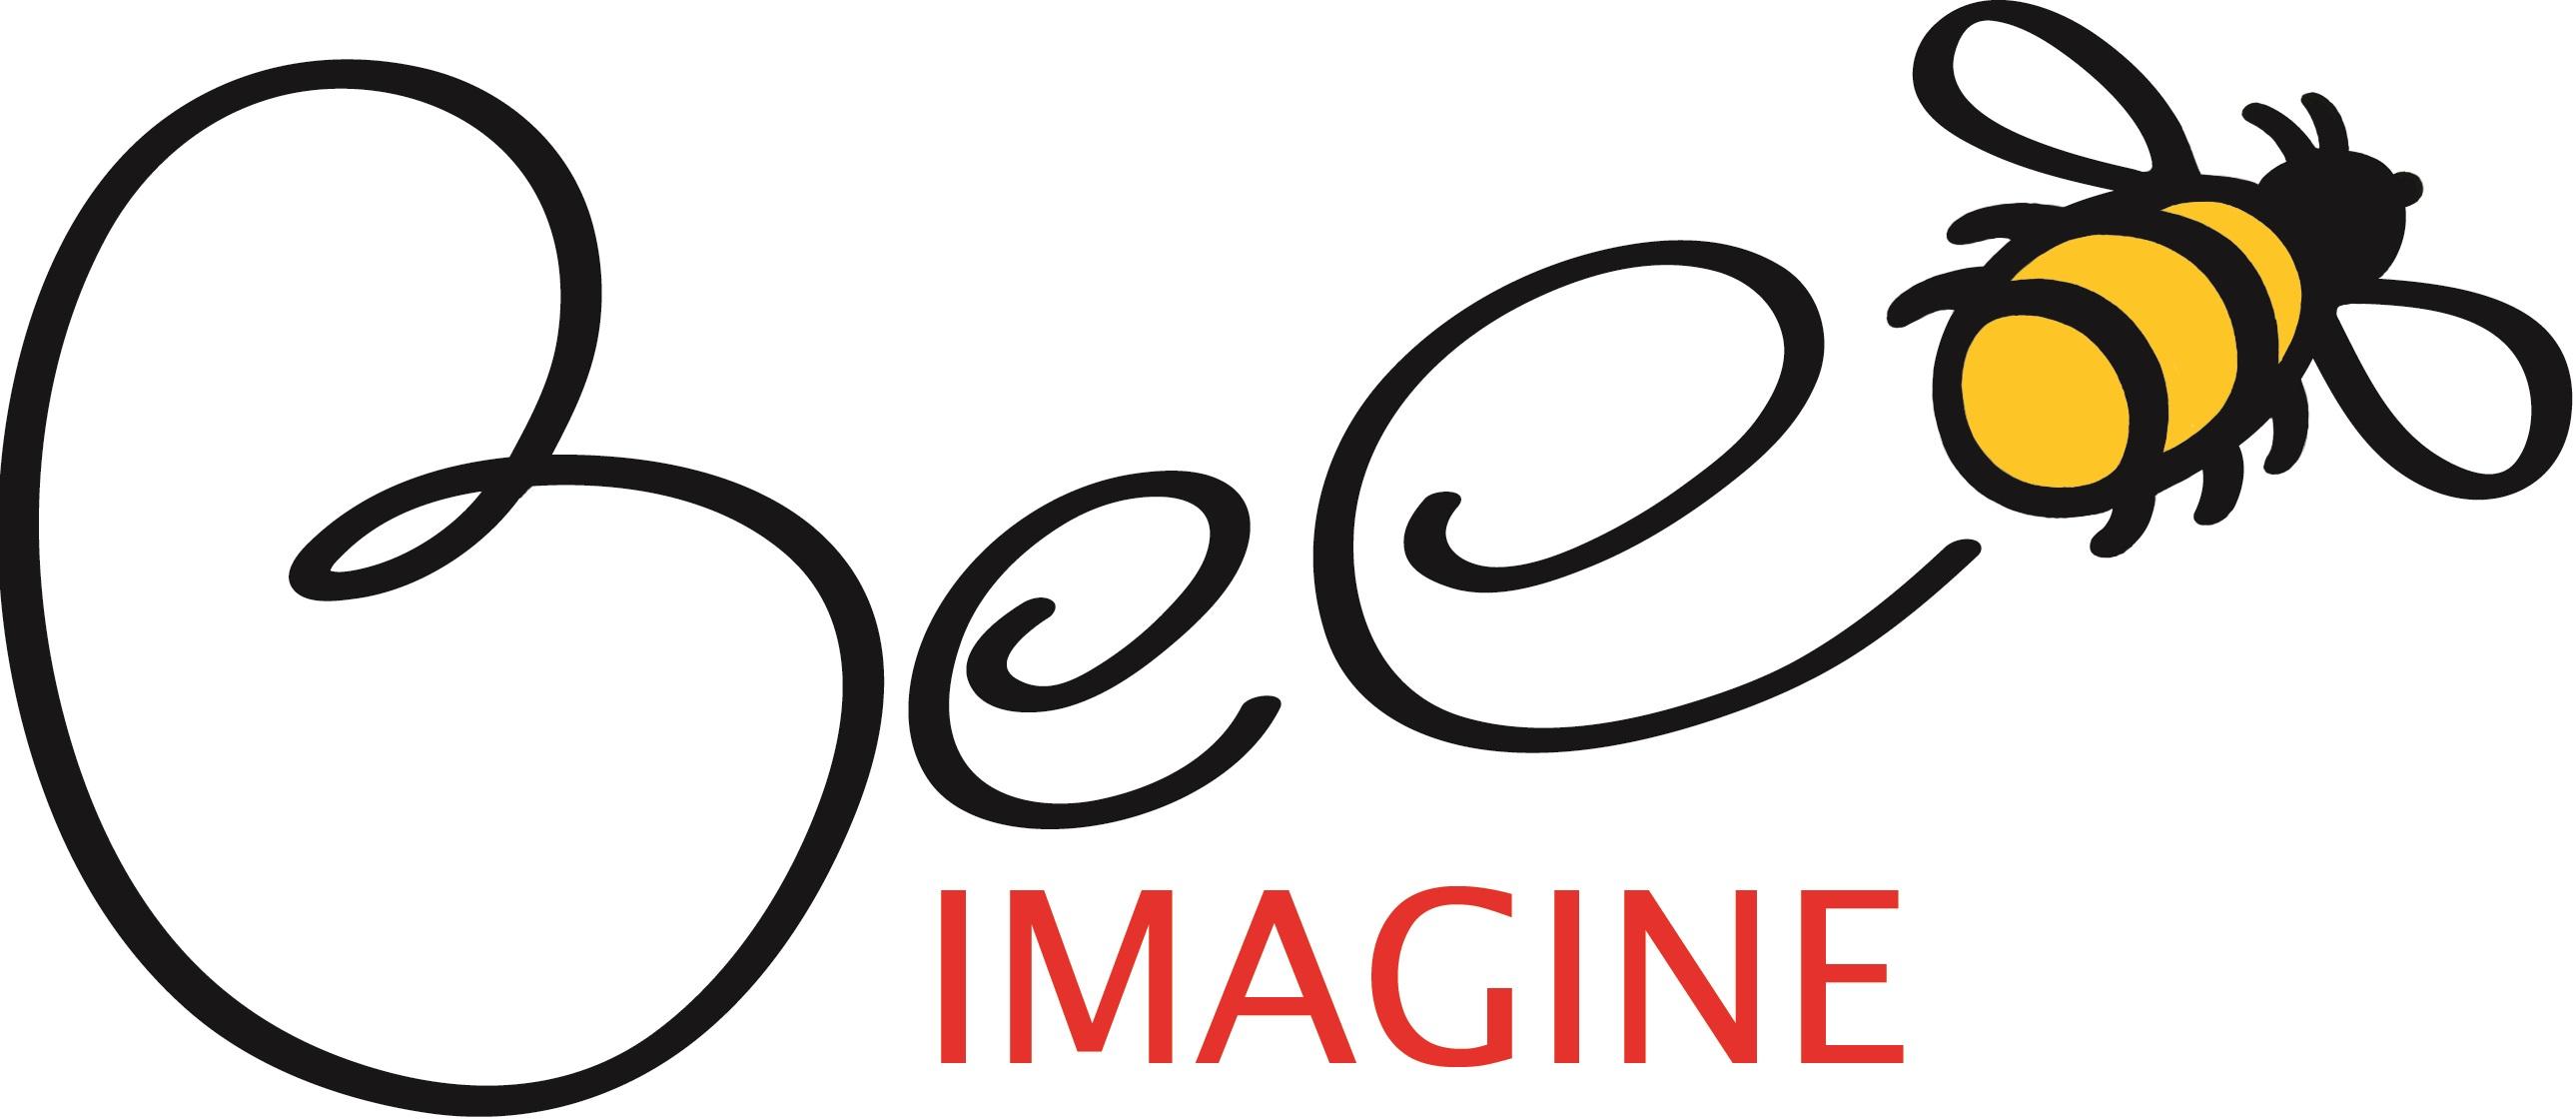 BEE IMAGINE logo